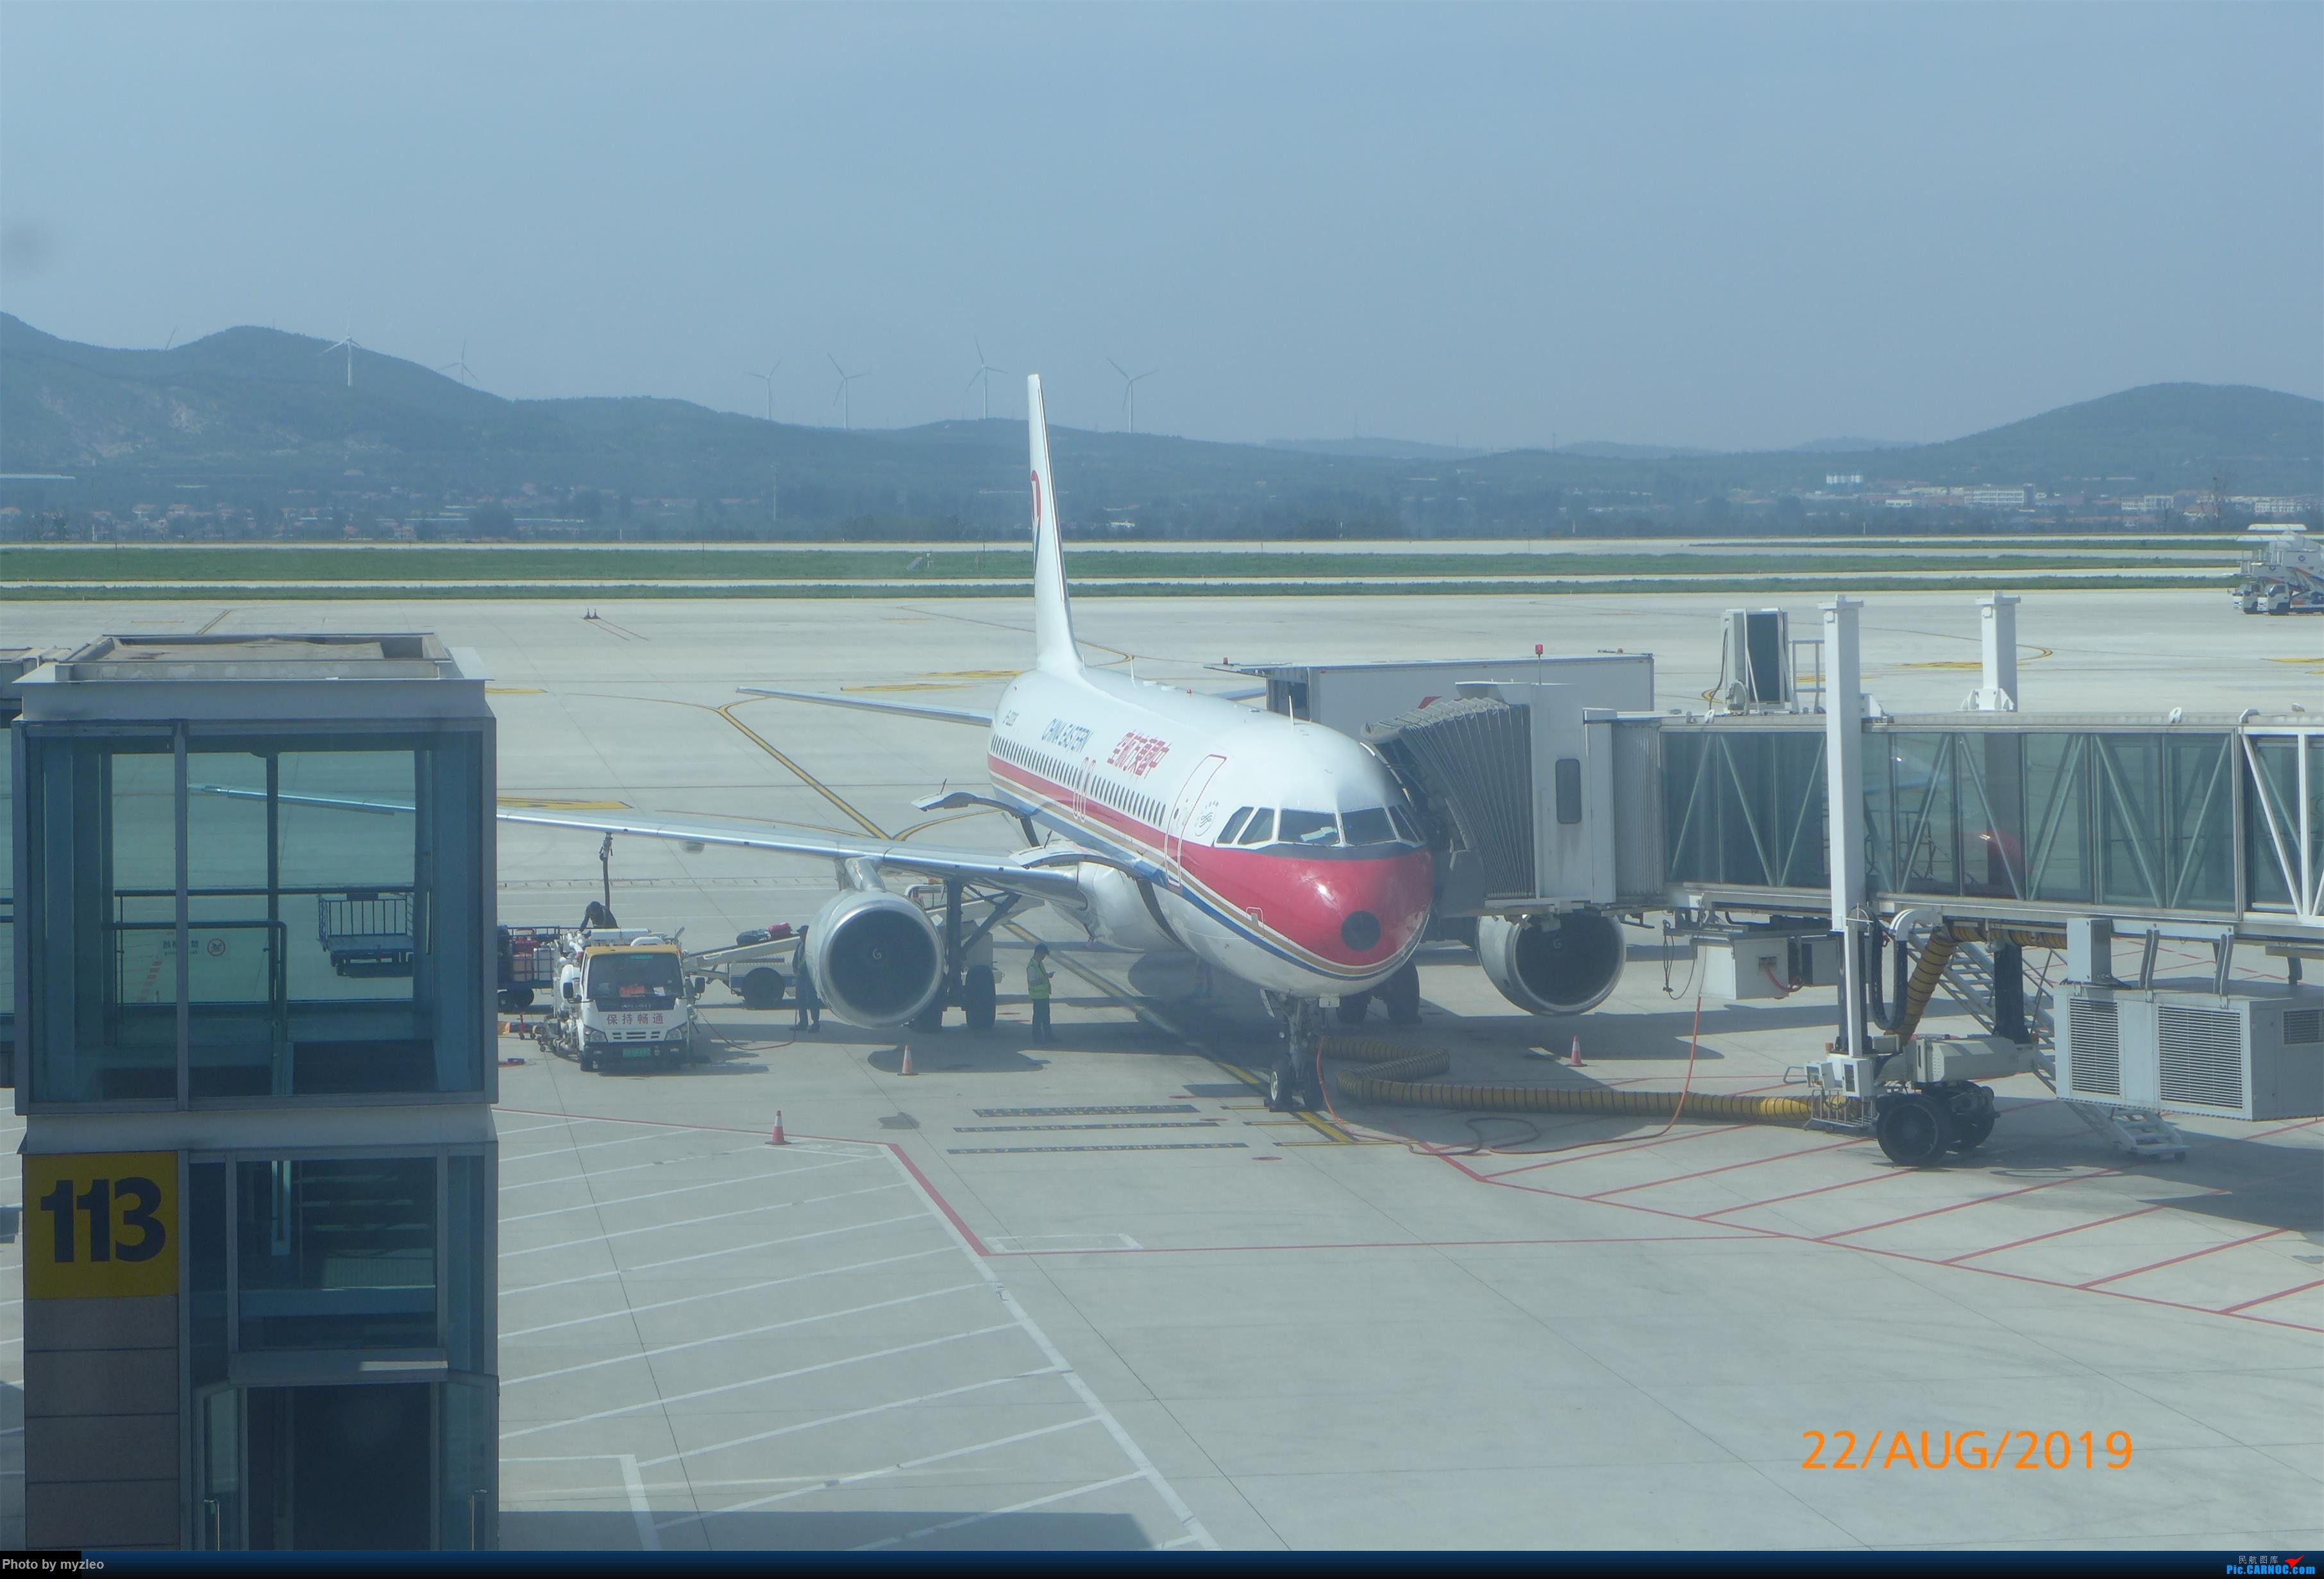 Re:[原创]【myzleo的游记5.2】梦圆一九(2)首访南苑把梦圆,初搭巴航连新缘 AIRBUS A320-200 B-8406 中国烟台蓬莱国际机场